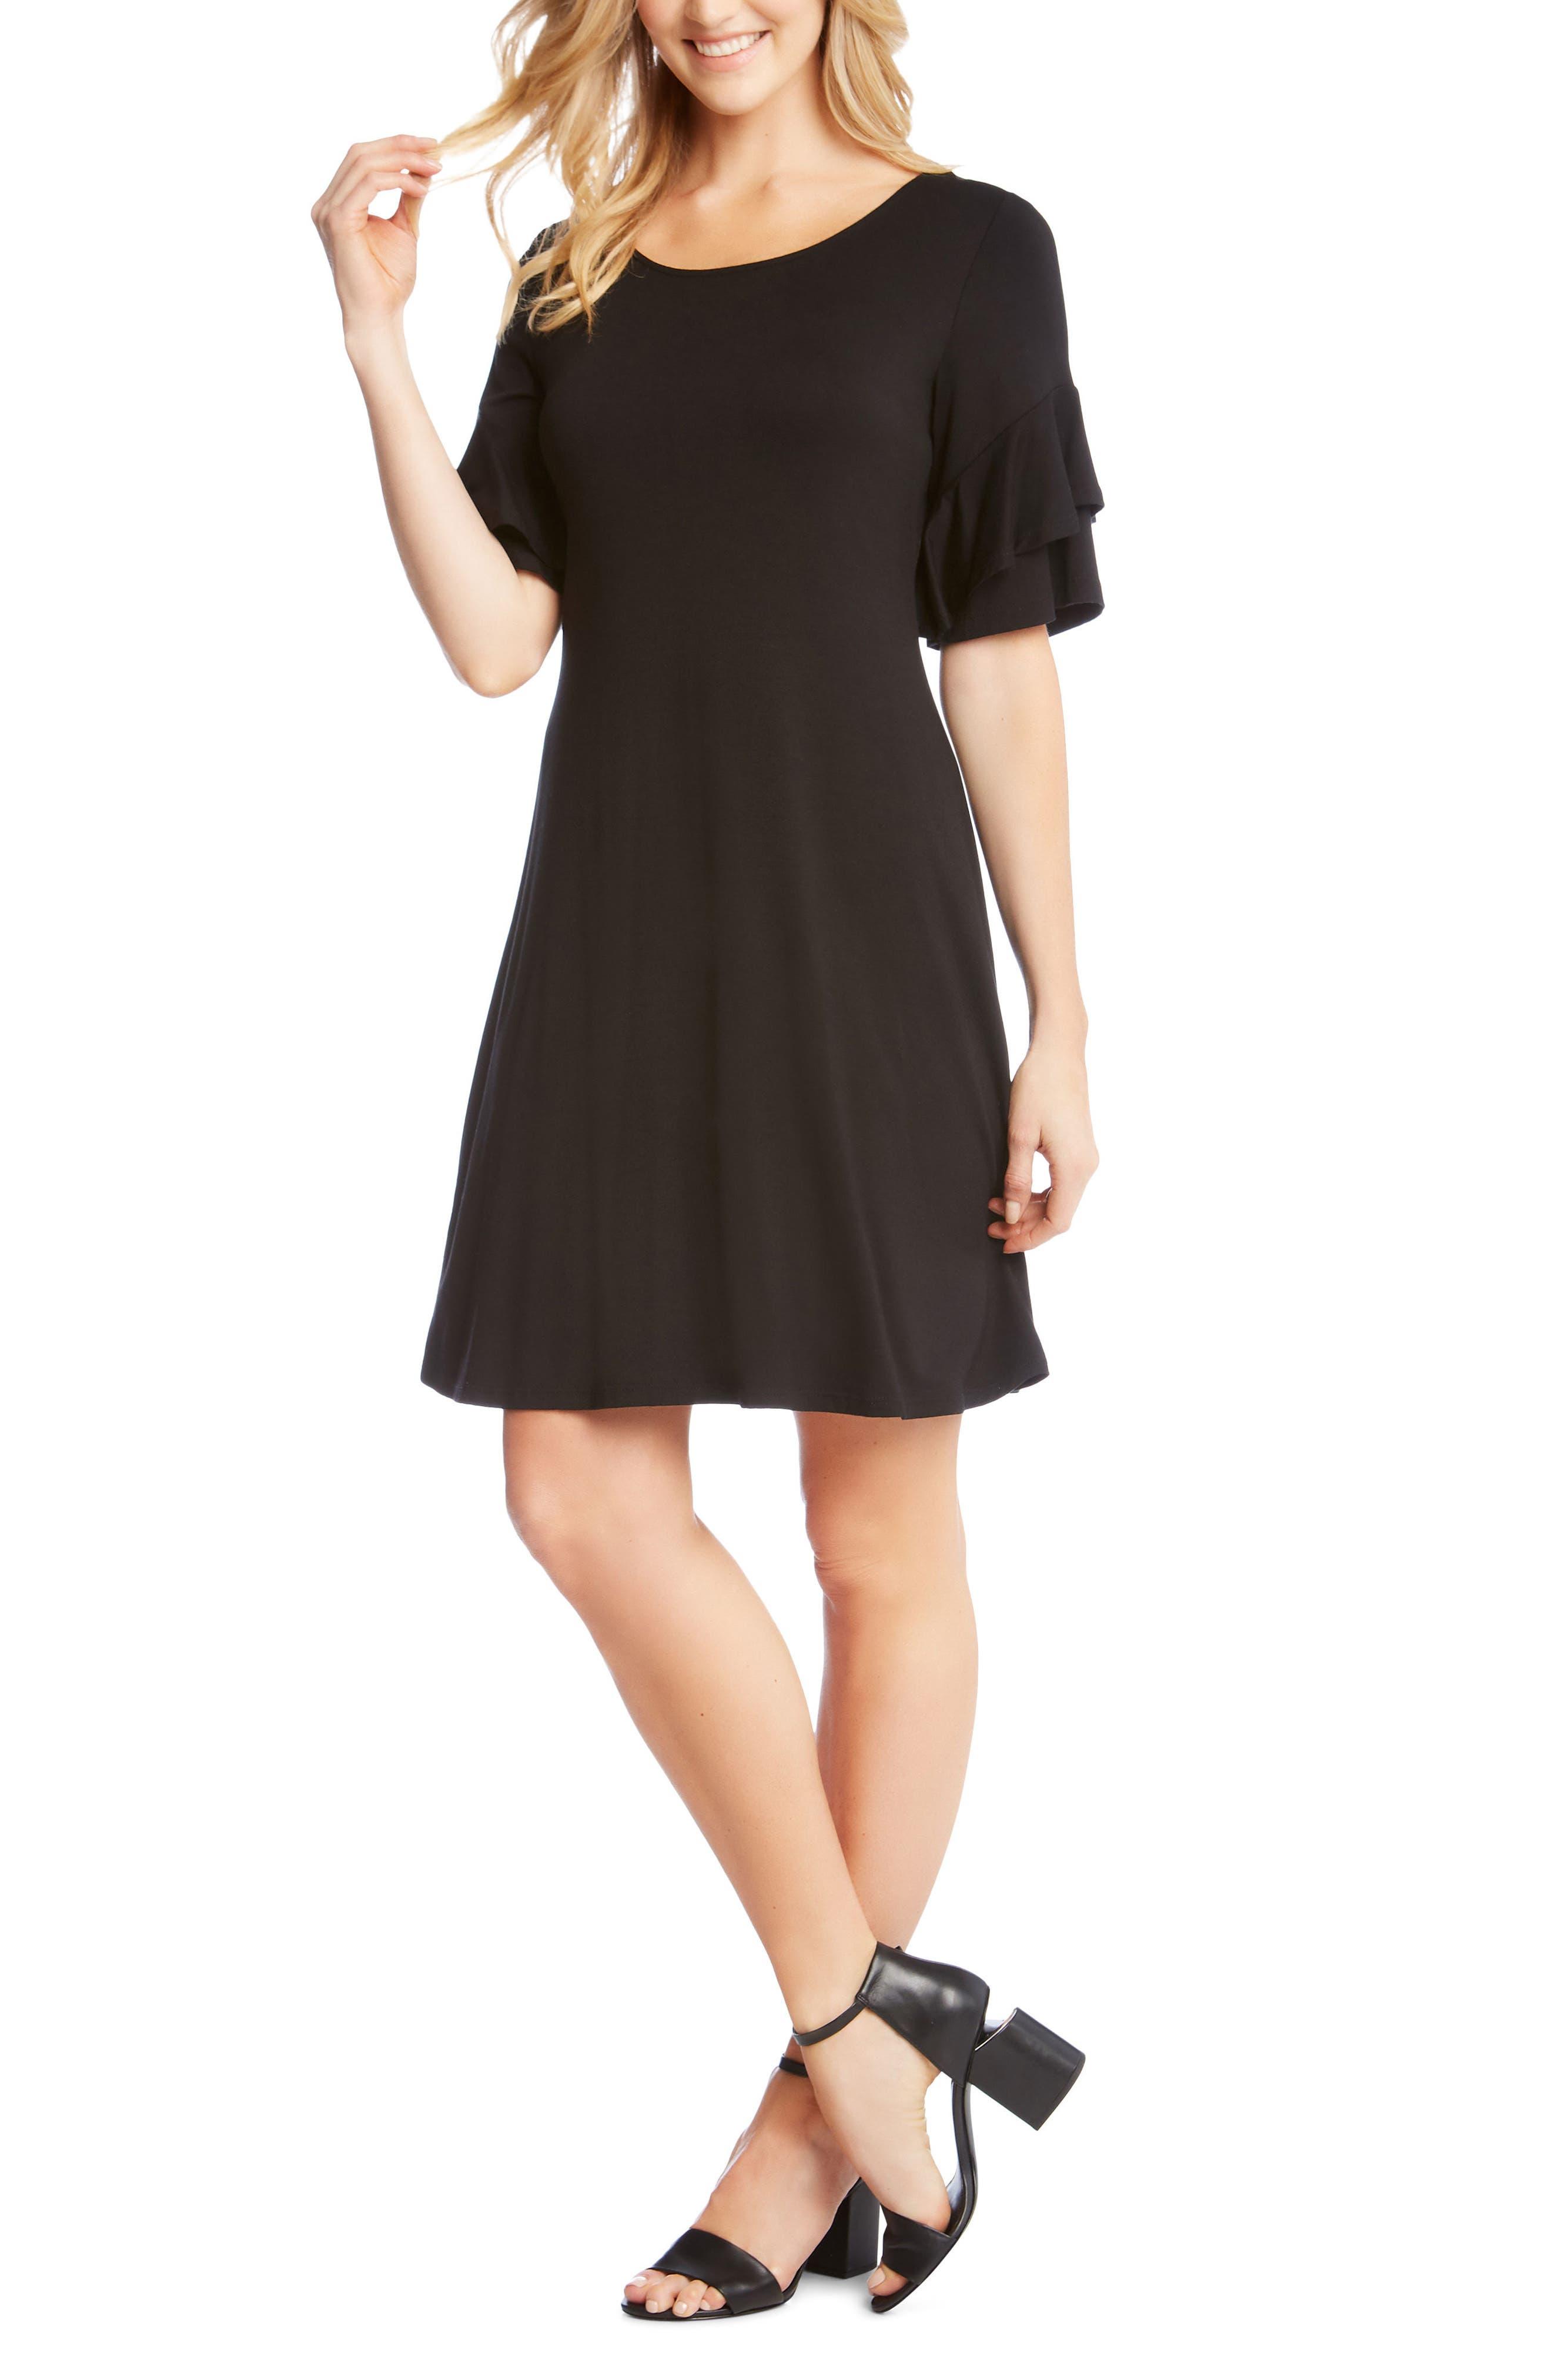 Ruffle Sleeve Jersey Knit Dress,                             Main thumbnail 1, color,                             001